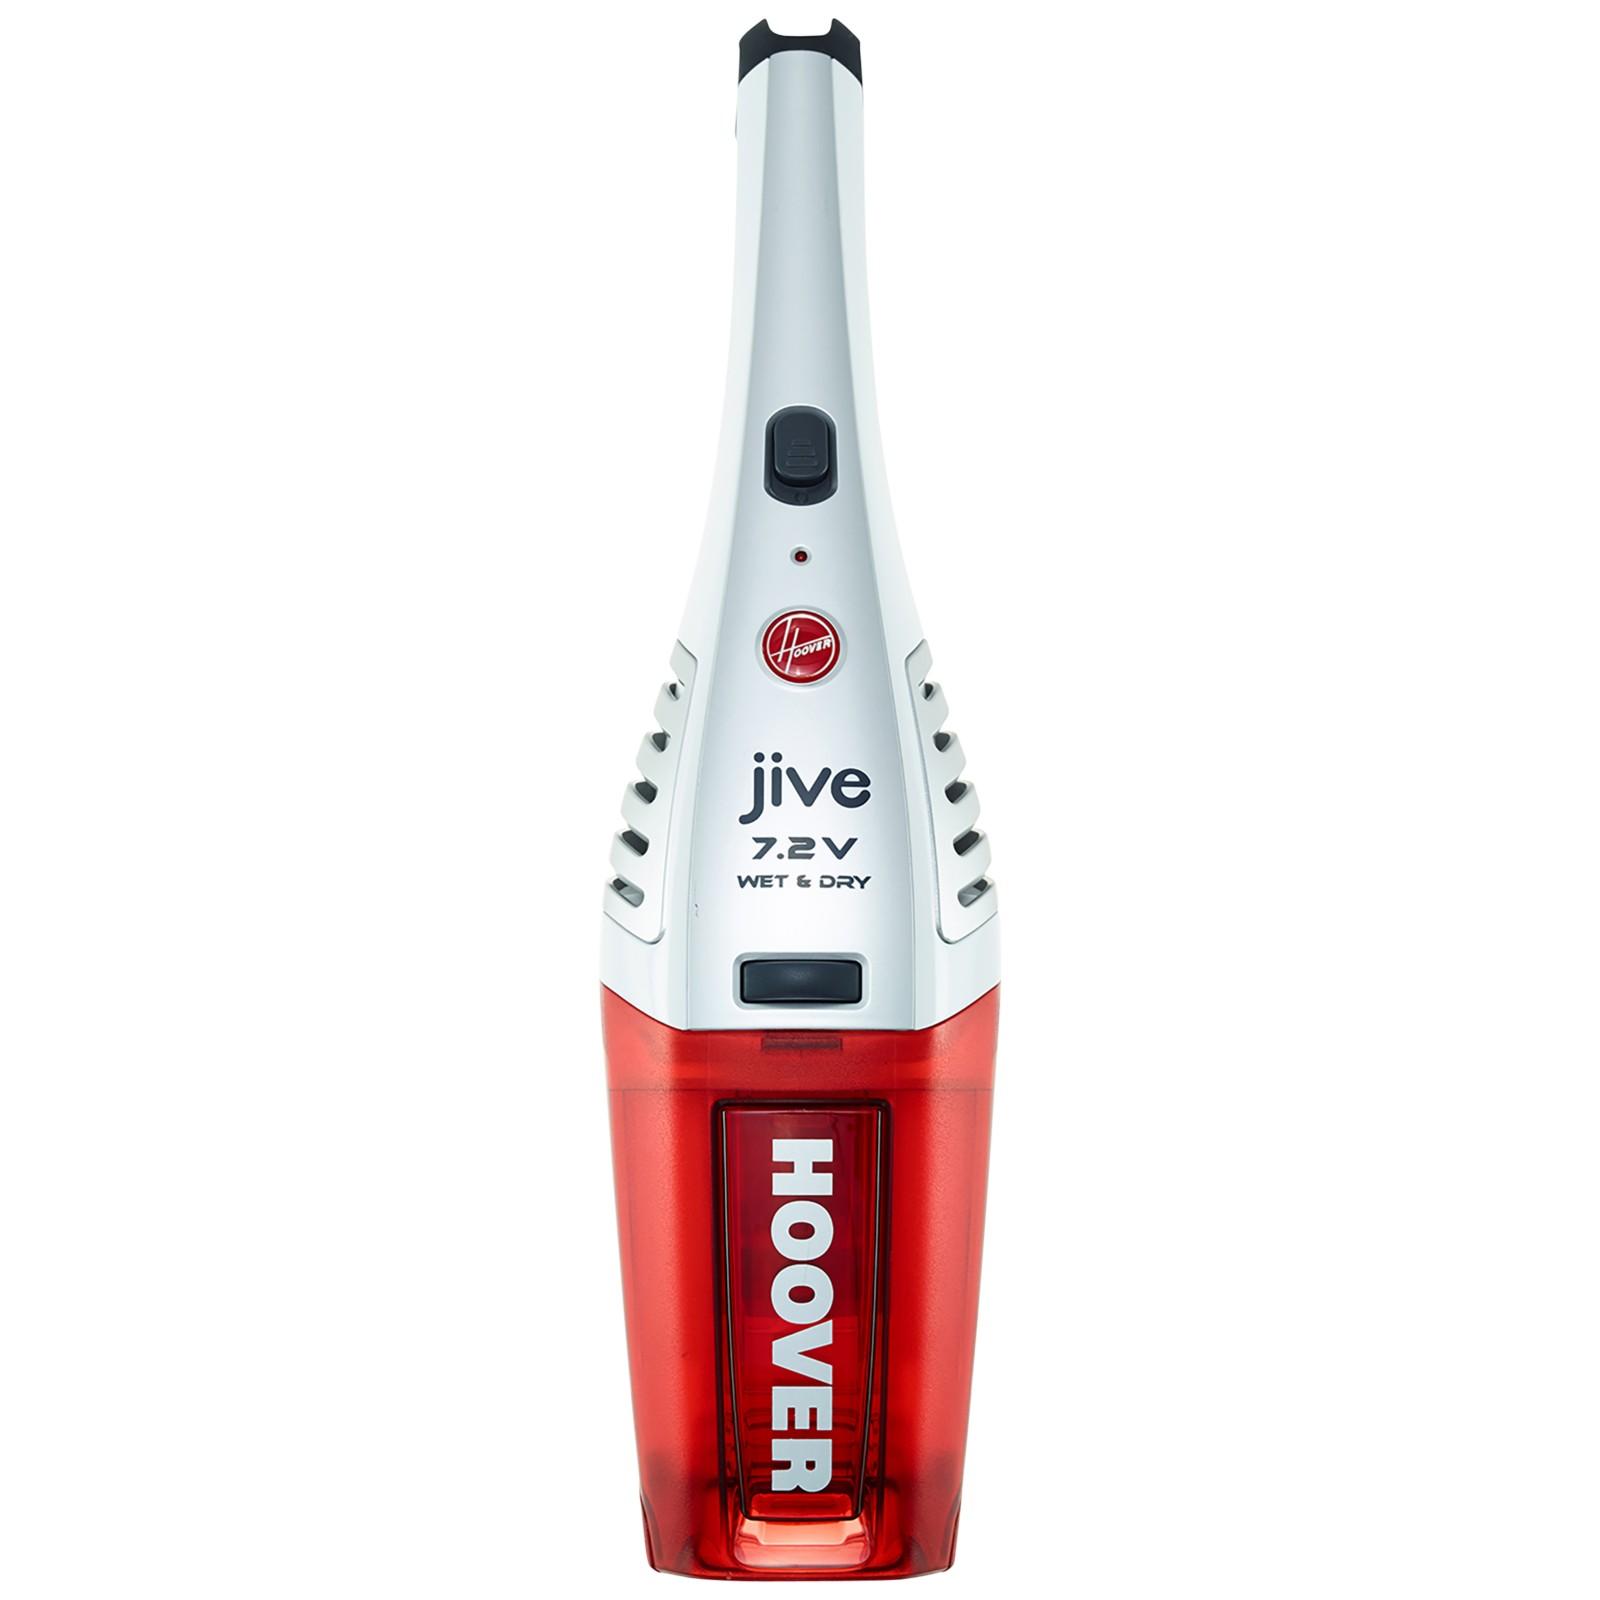 Hoover SJ72WWB6 Jive Wet & Dry 7.2V Cordless Handheld Vacuum Cleaner